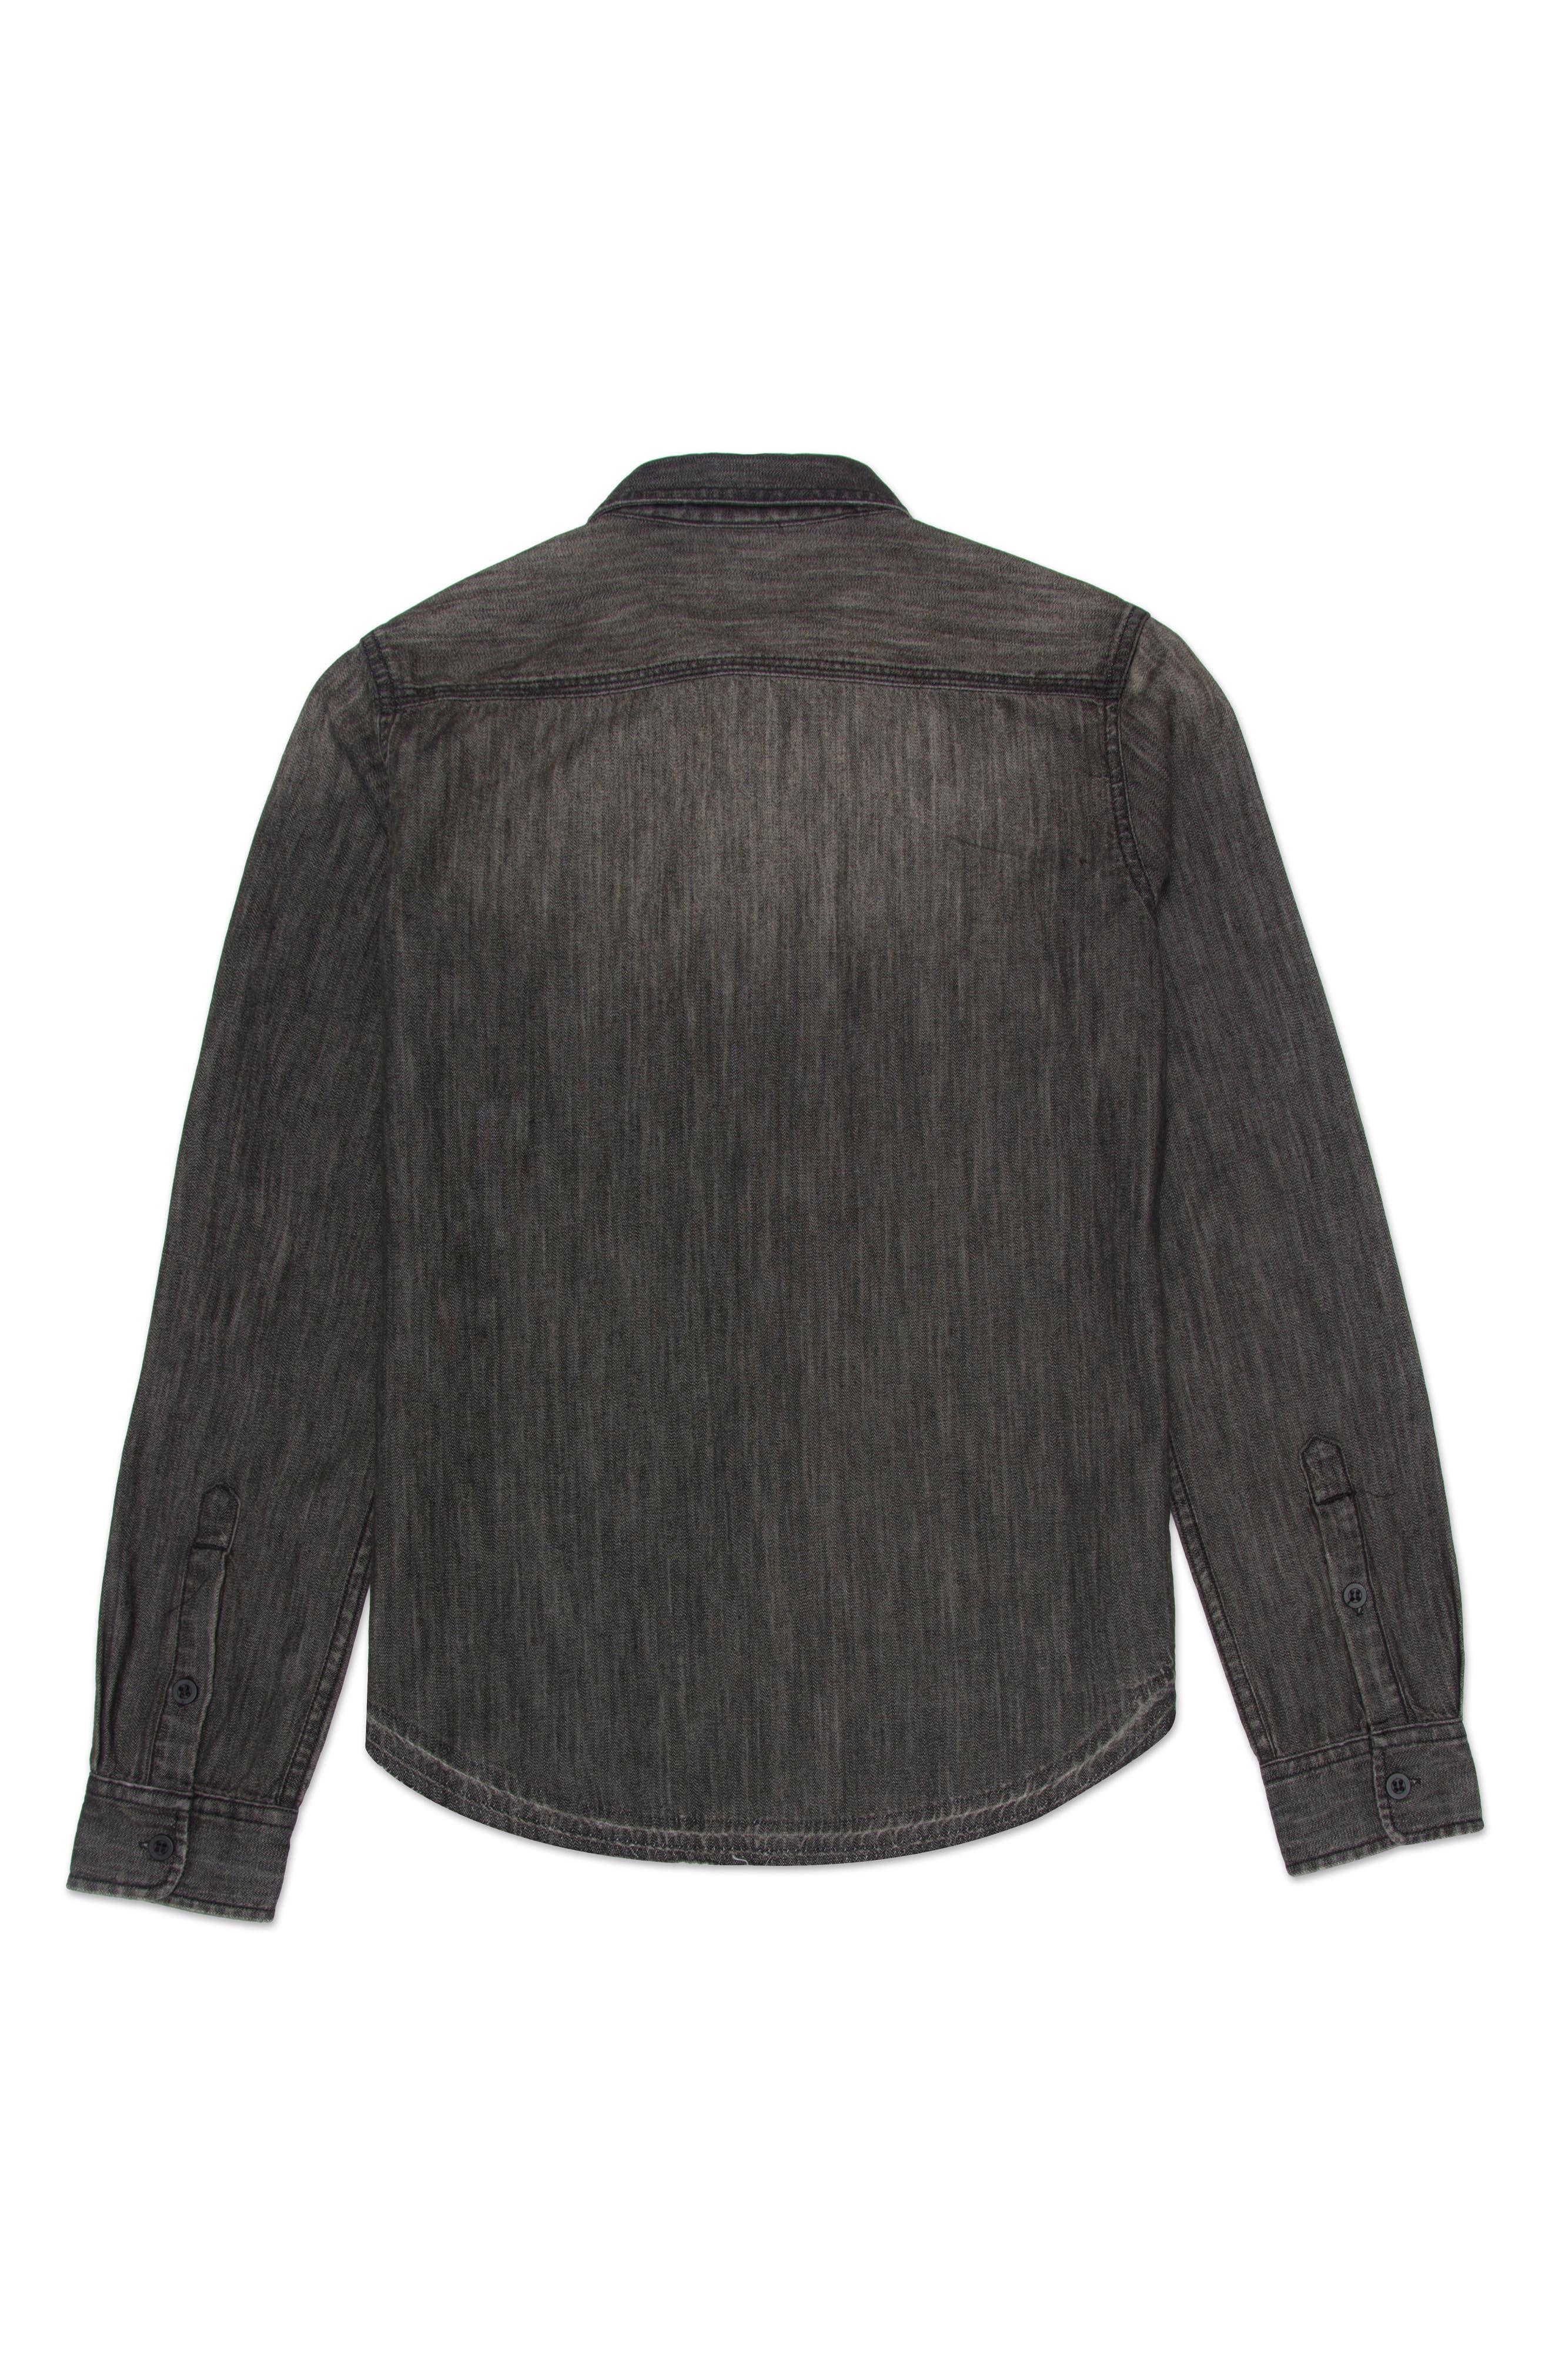 Bryson Chambray Shirt,                             Alternate thumbnail 2, color,                             Faded Black